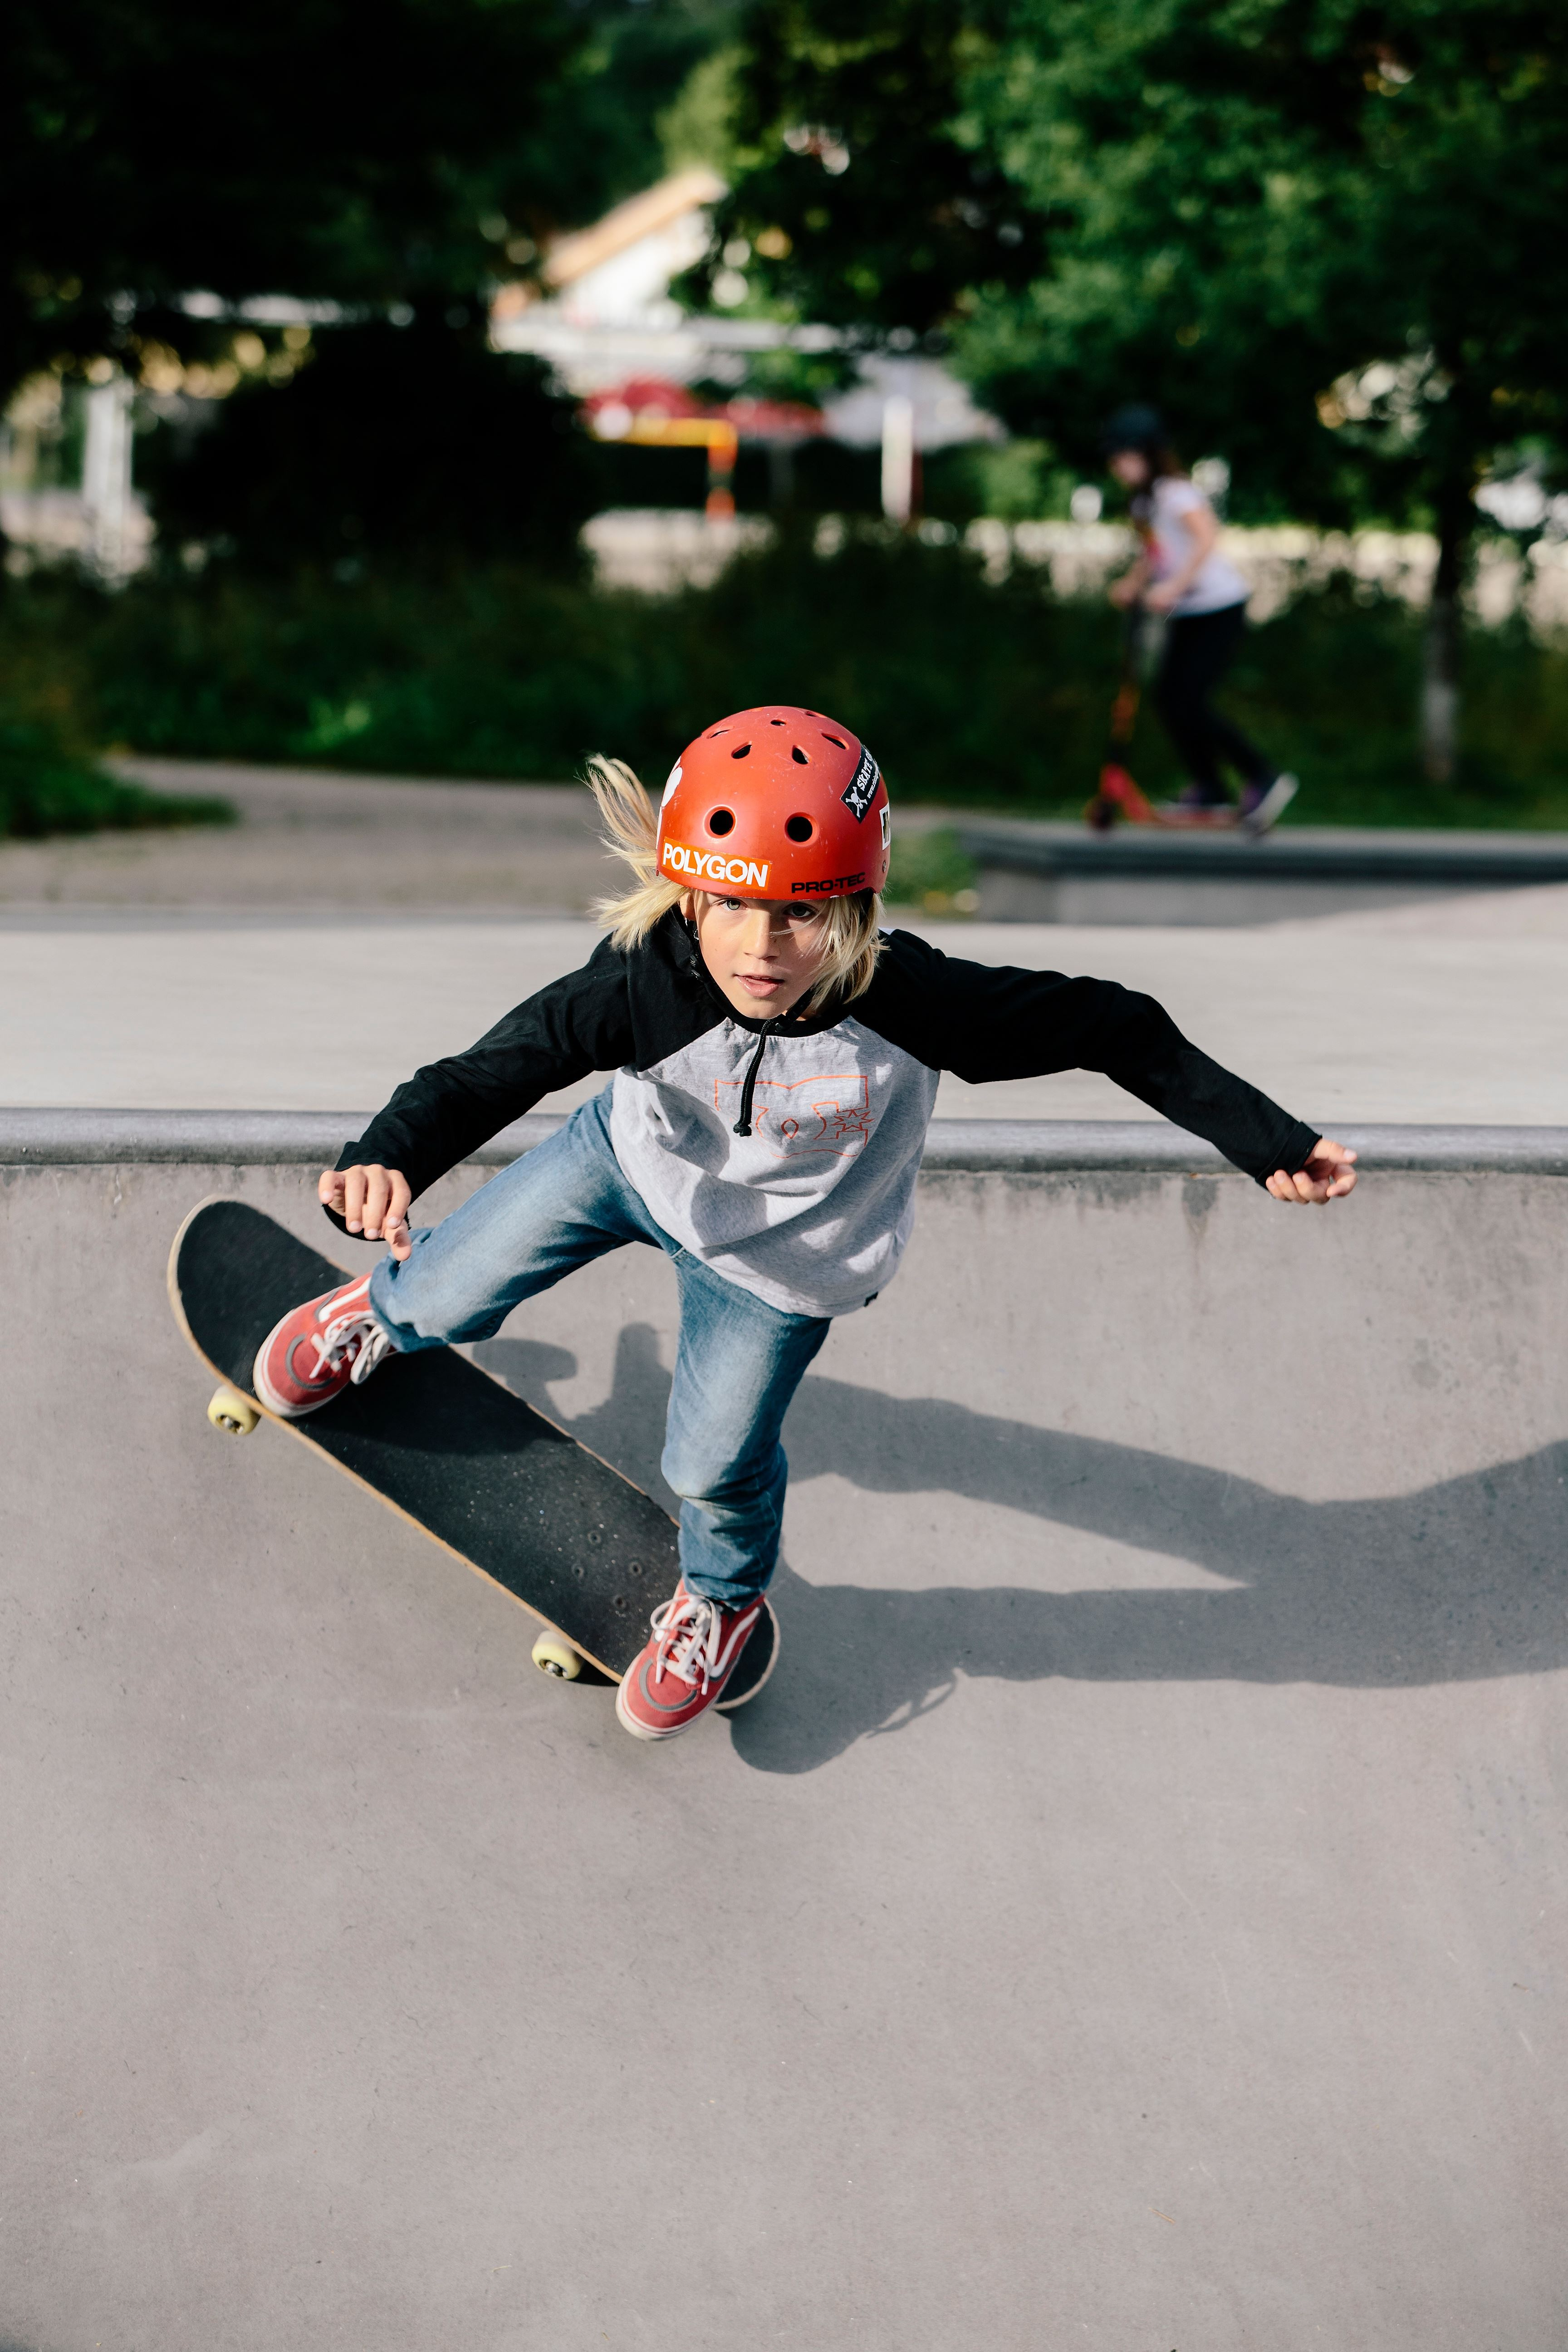 Jonas Ljungdahl, The skatepark at Spetsamossen